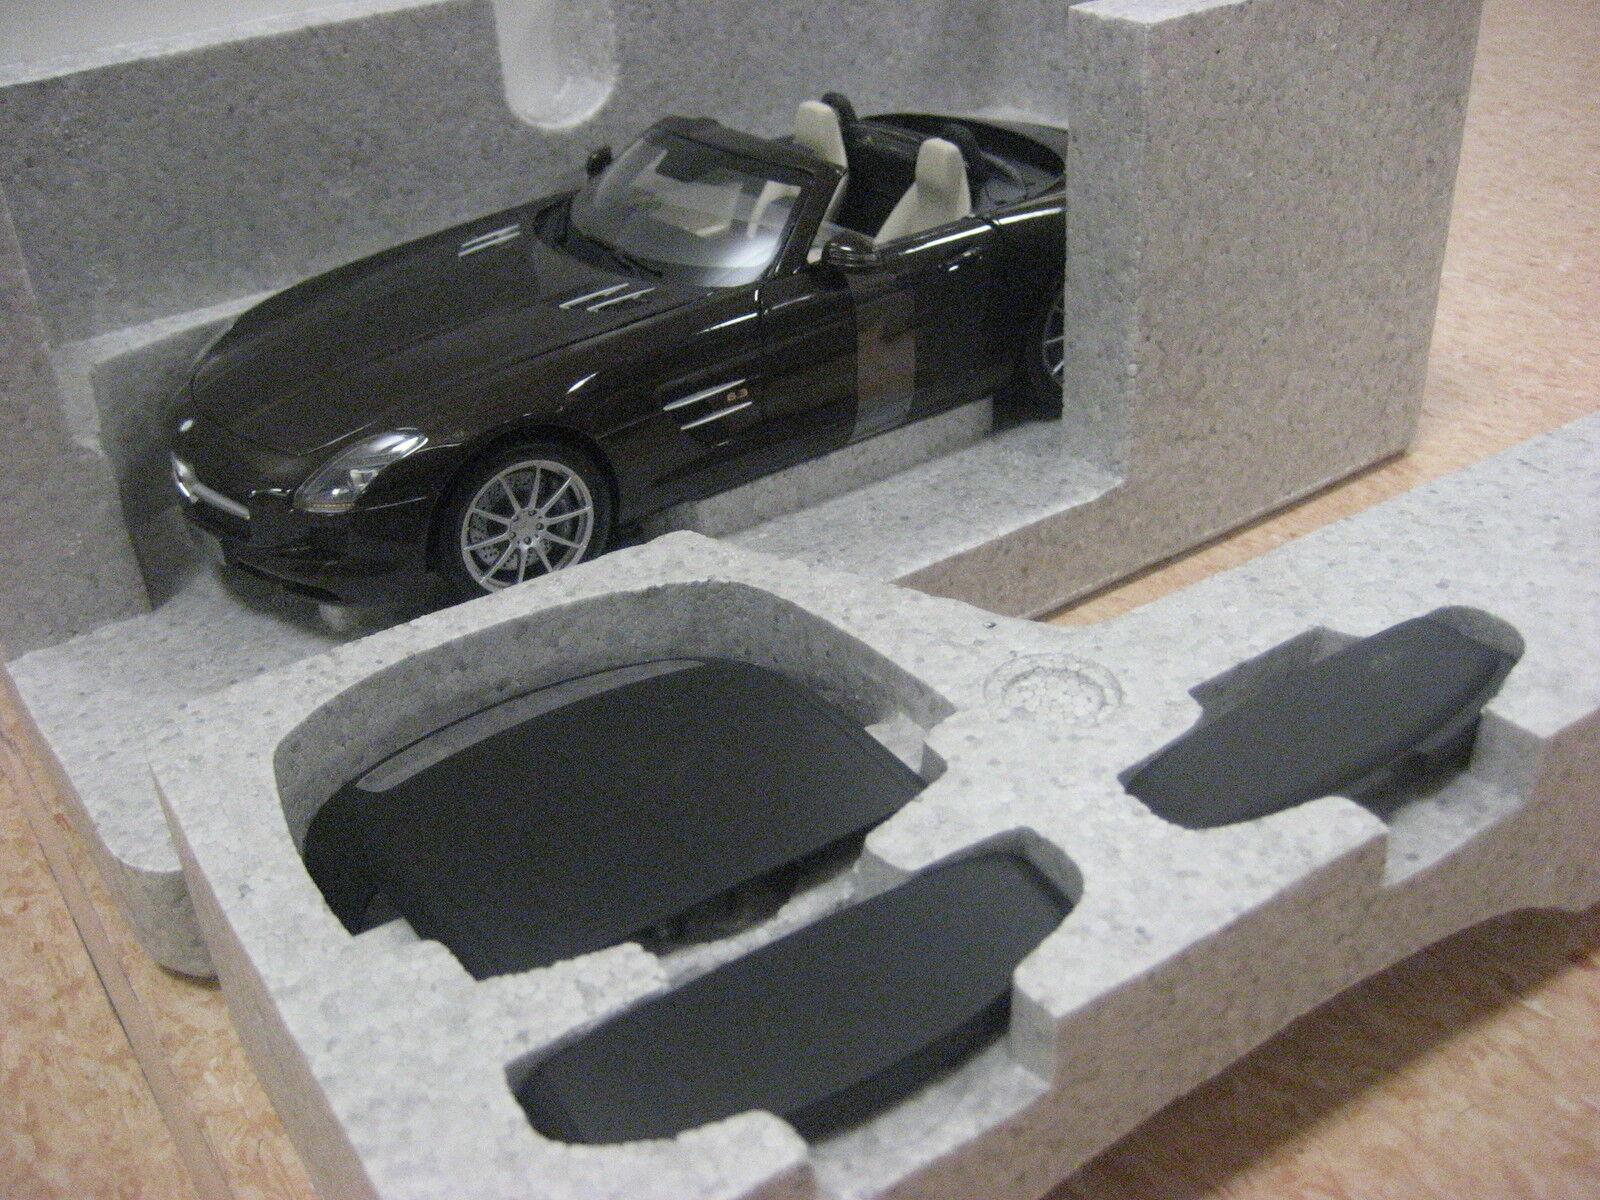 MERCEDES MERCEDES MERCEDES SLS Roadster Marrone 1:18 Minichamps Nuovo + OVP 1a42d2